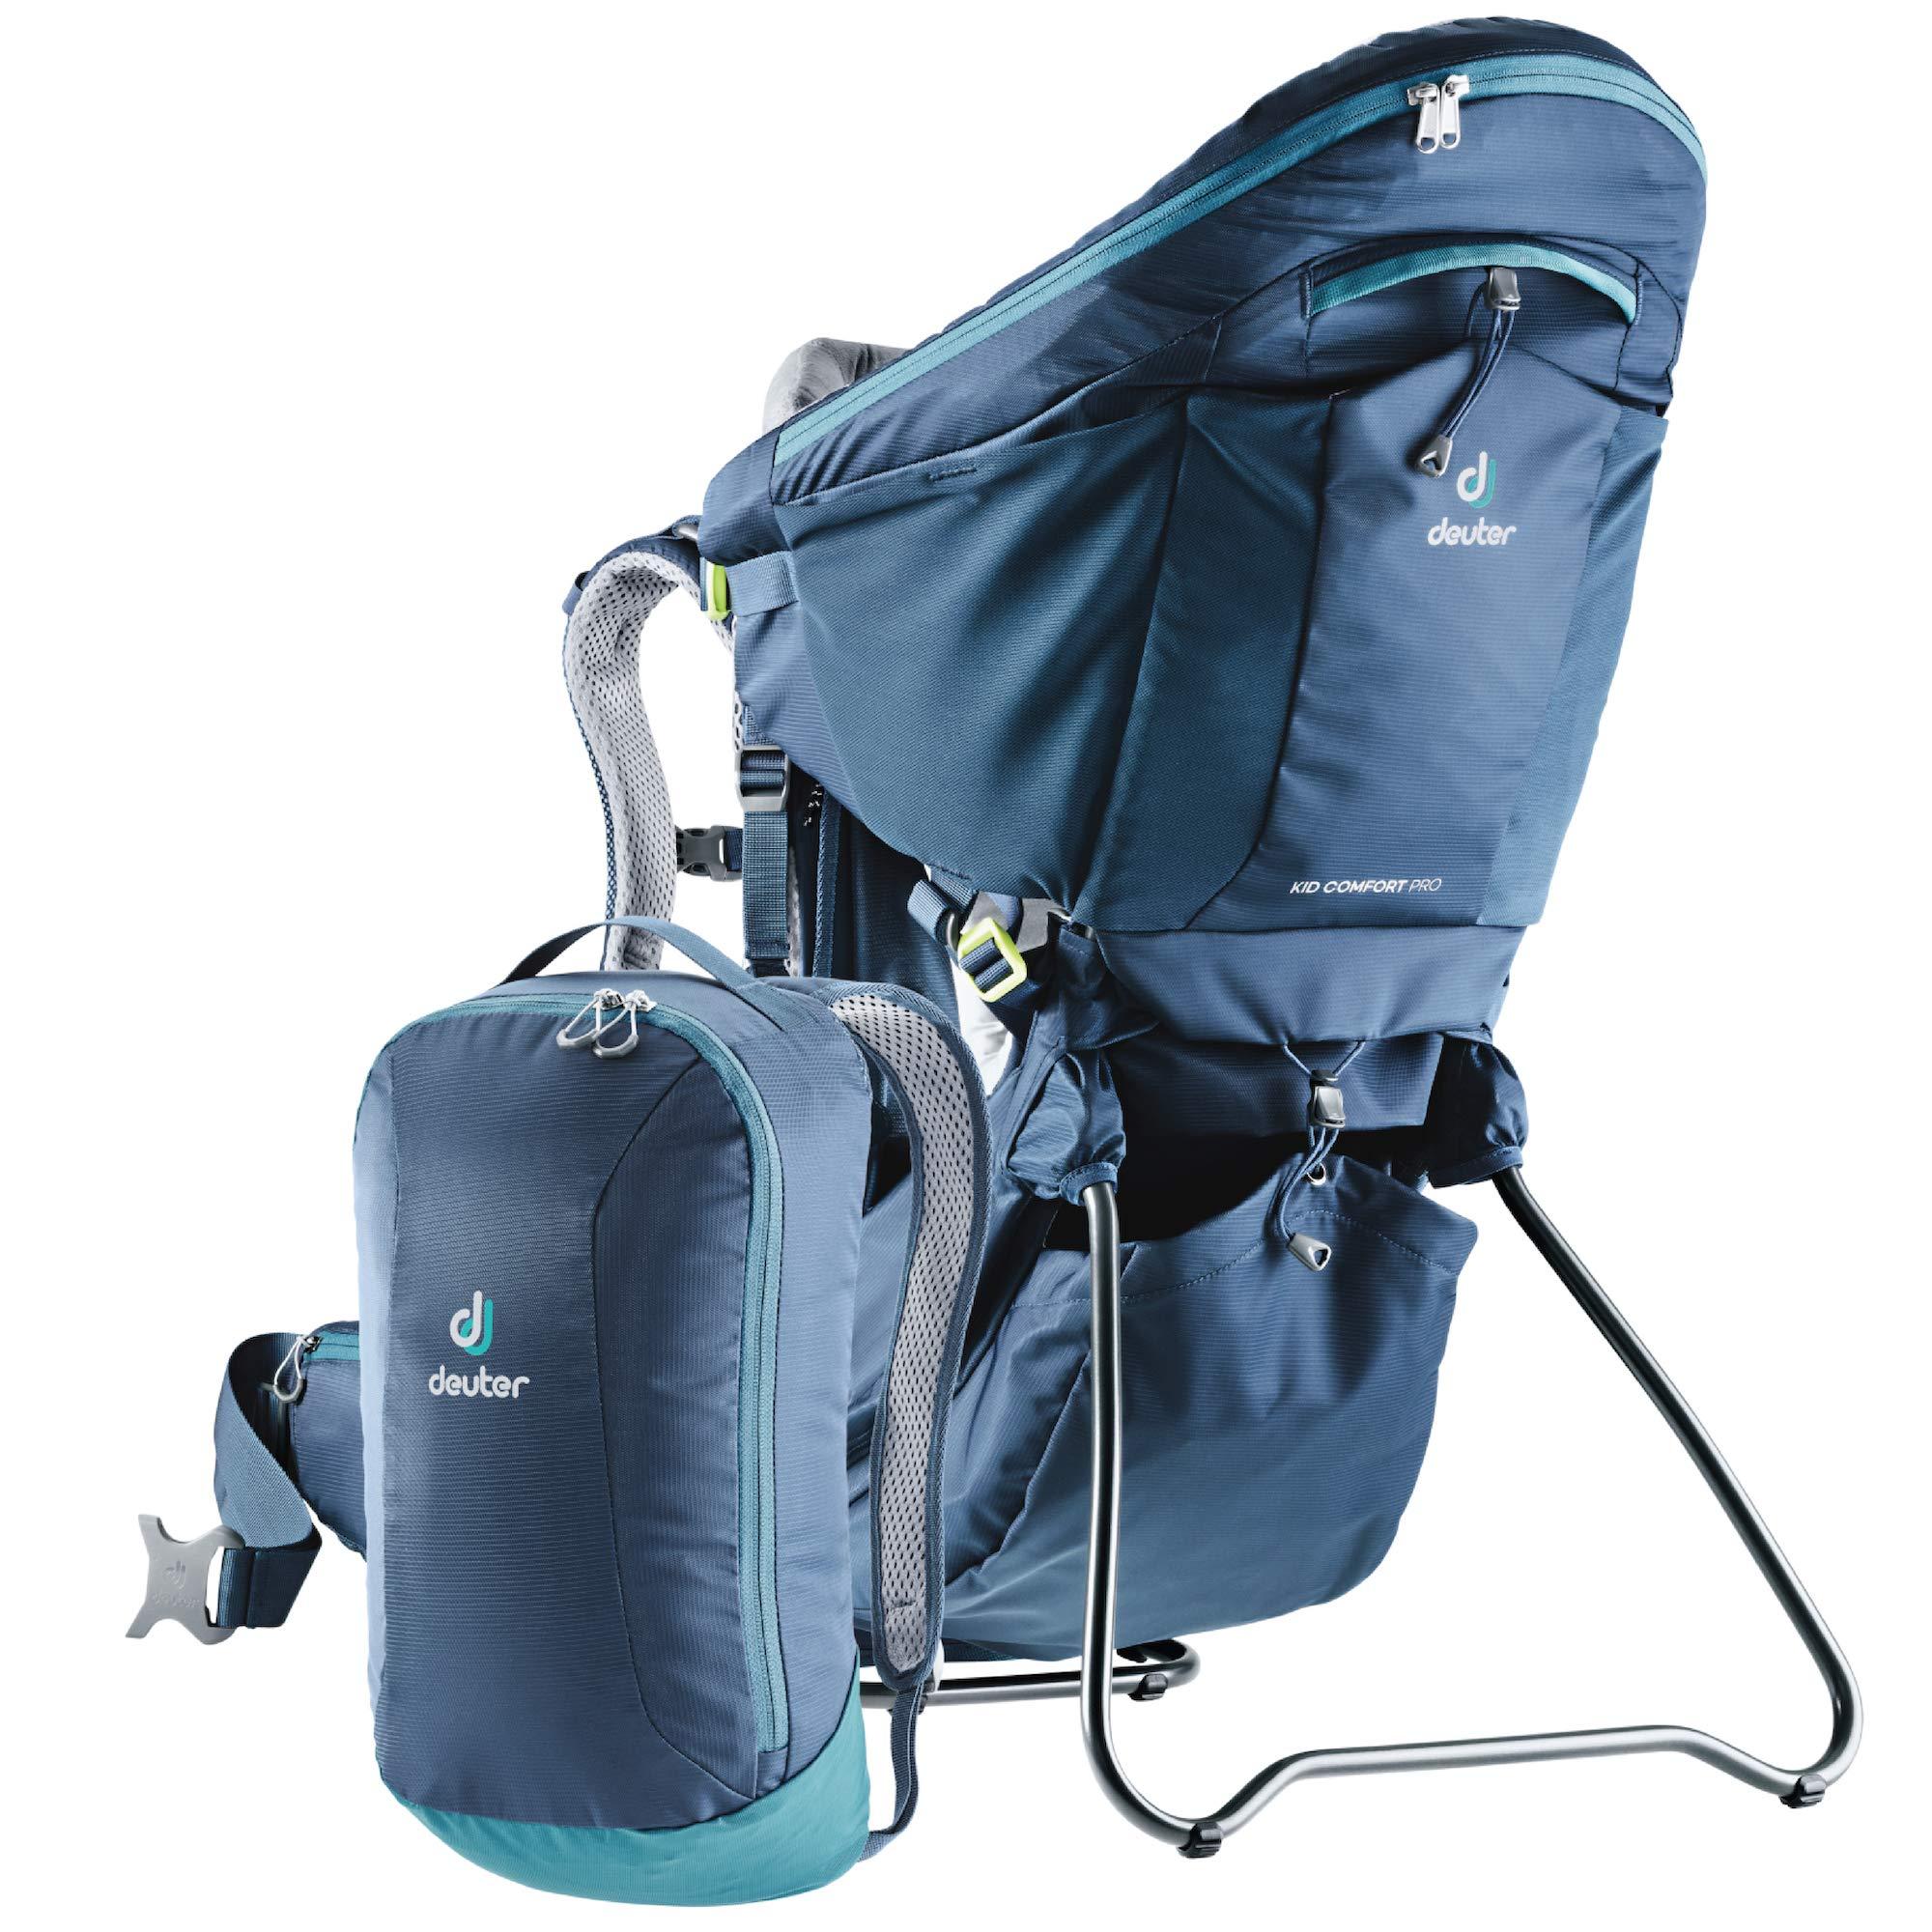 Deuter Kid Comfort Pro - Child Carrier Backpack, Midnight